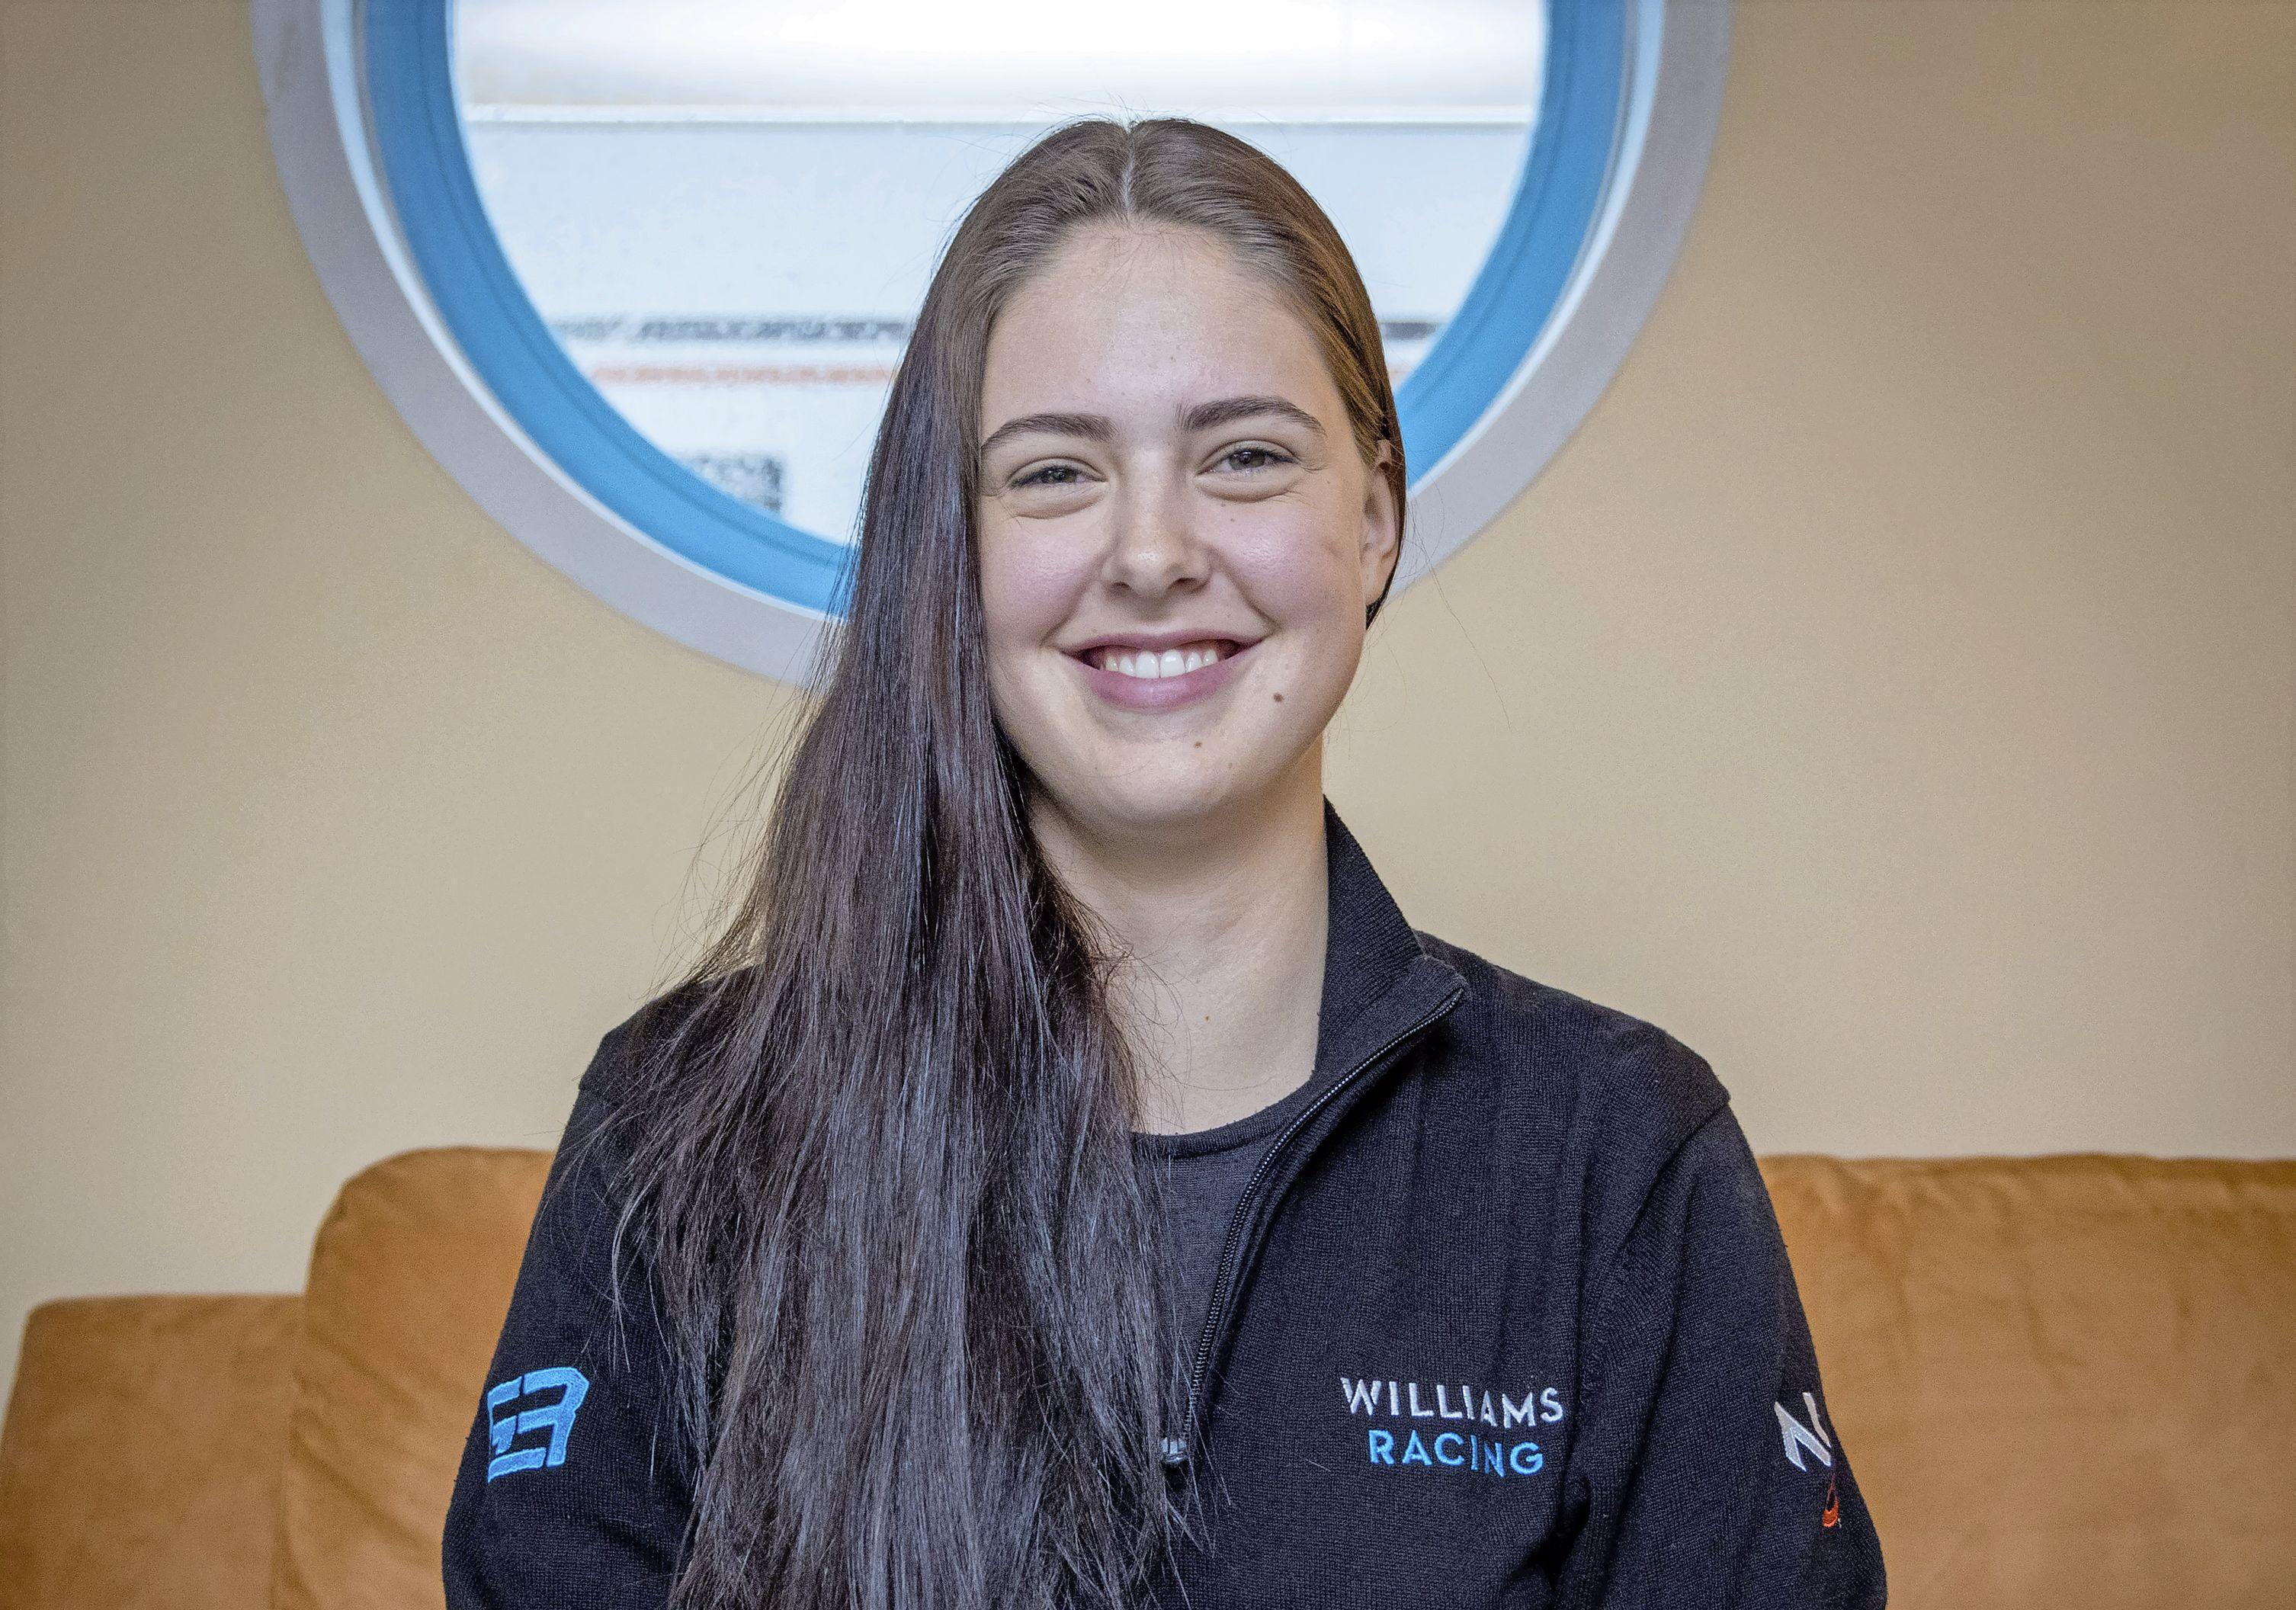 Baukje Baars (17) uit Grootebroek aast op werk in de Formule 1: 'Dit is mijn droom!'